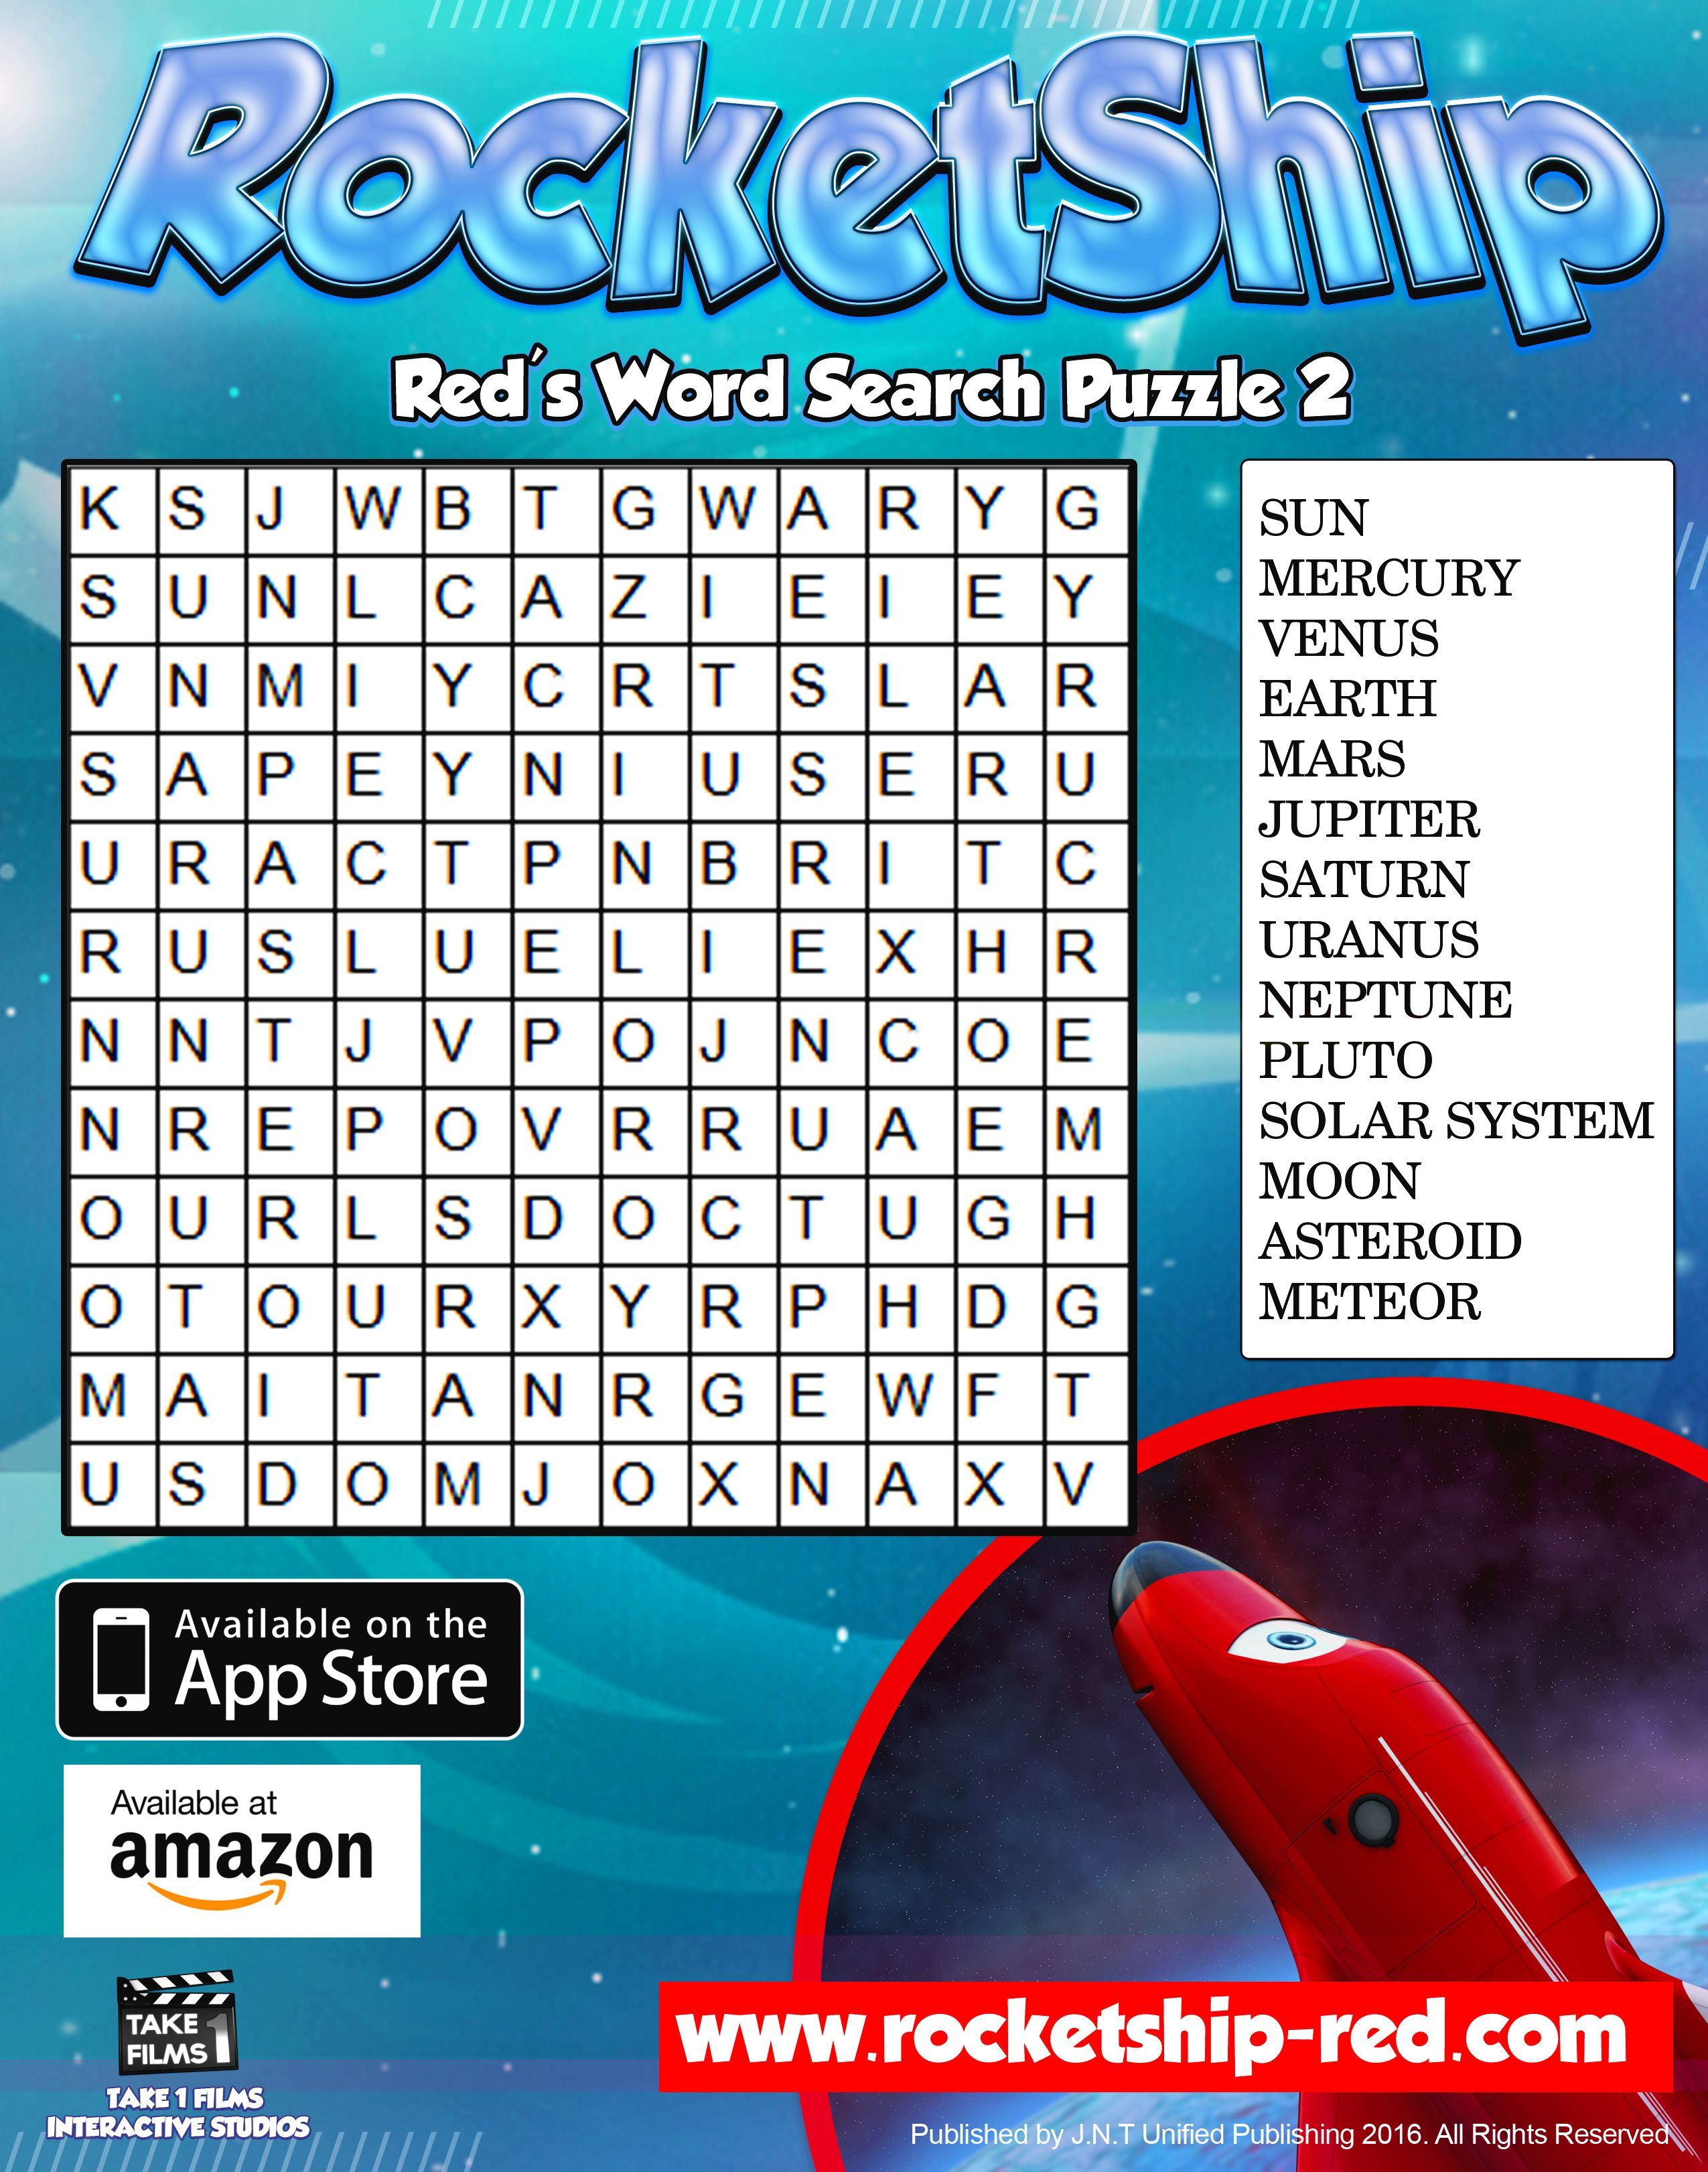 RocketShip Activity 6 Red's Word Search Puzzle 2